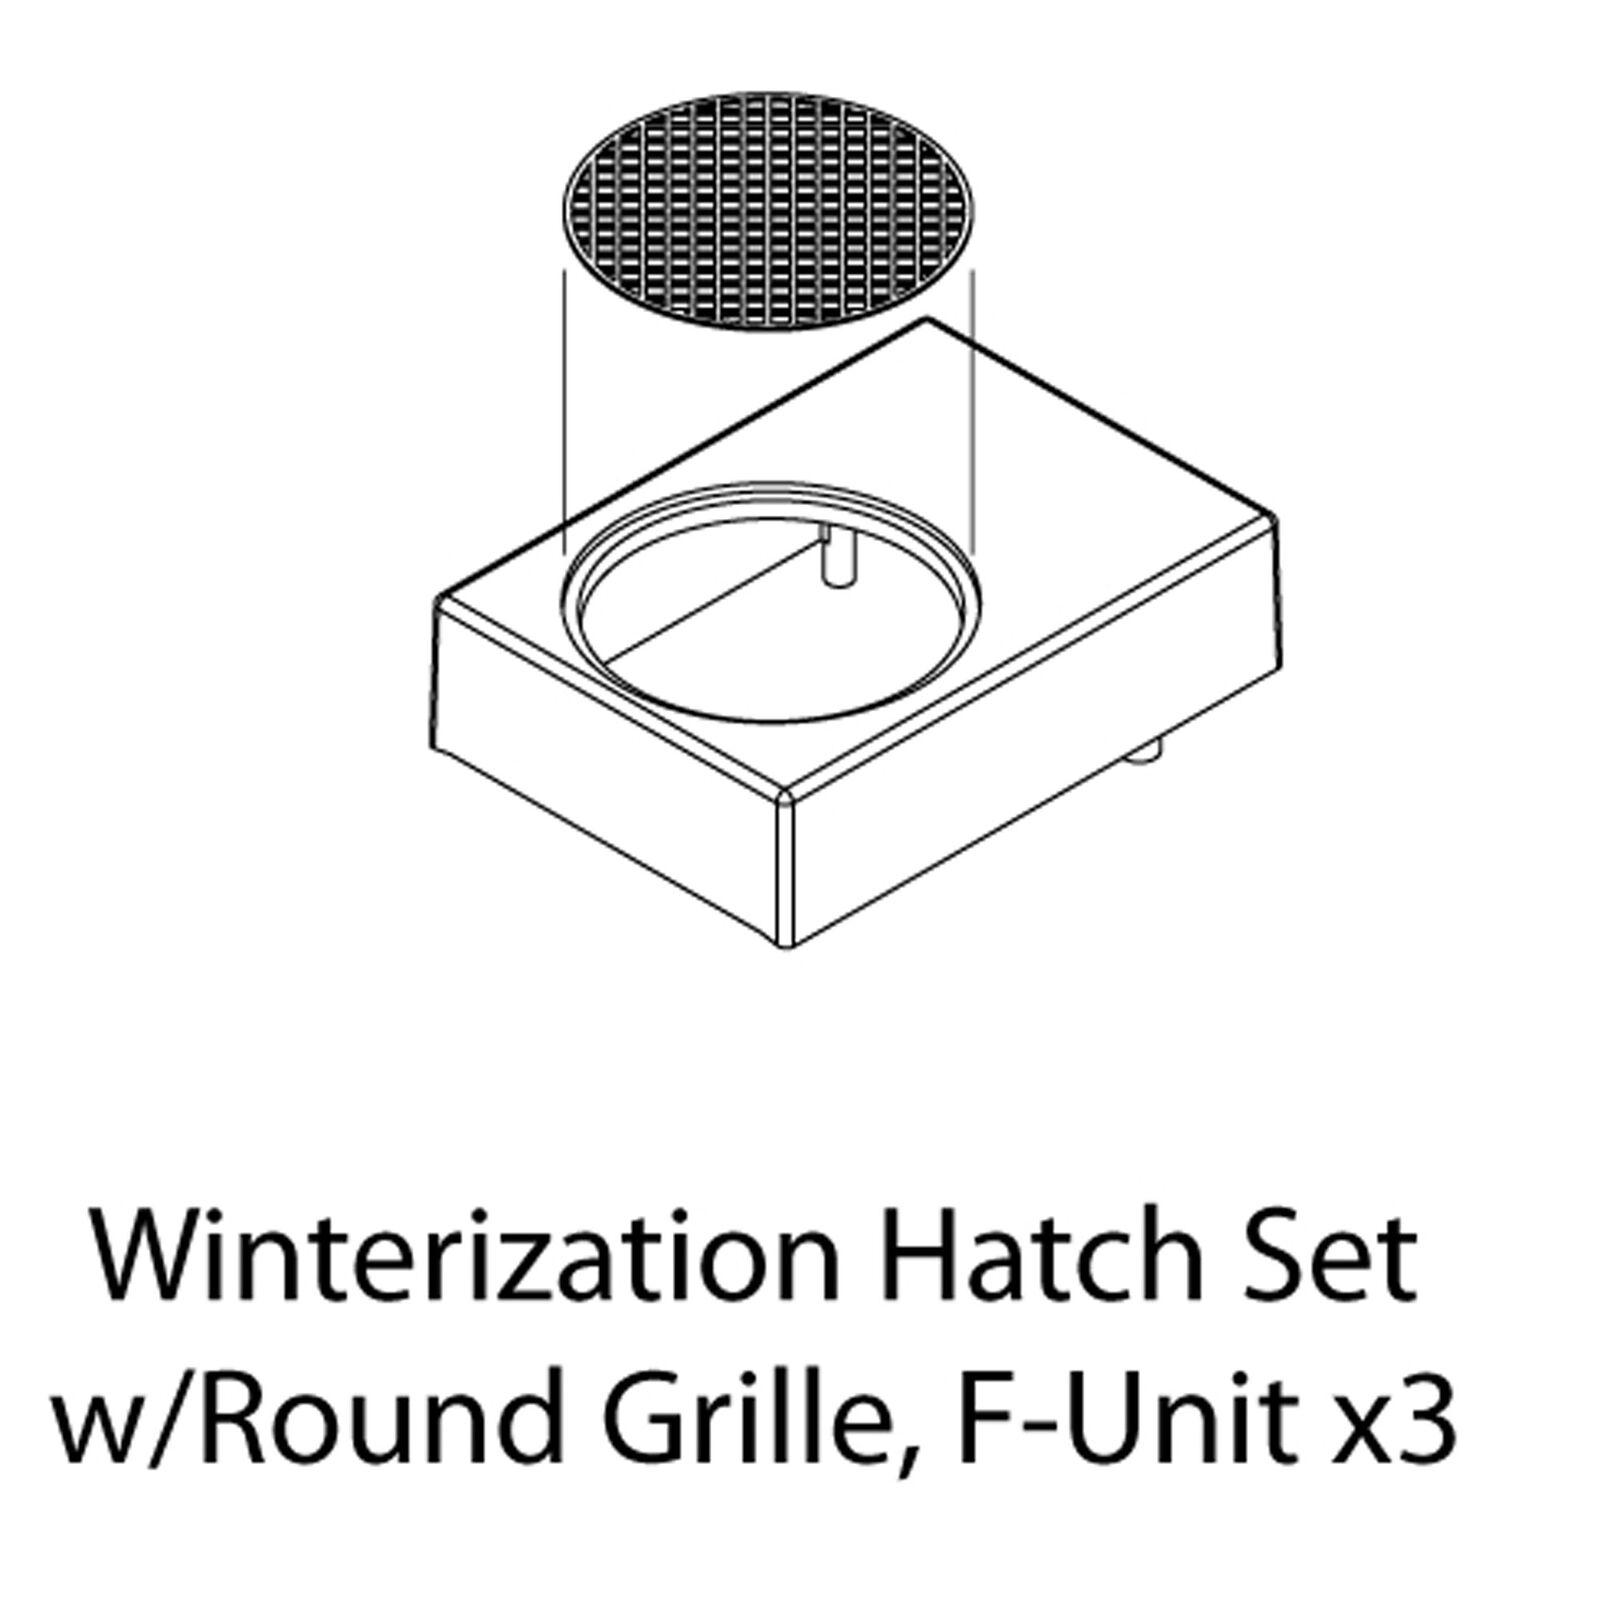 HO Winterization Hatch Set w/Round Grille, F-Unit